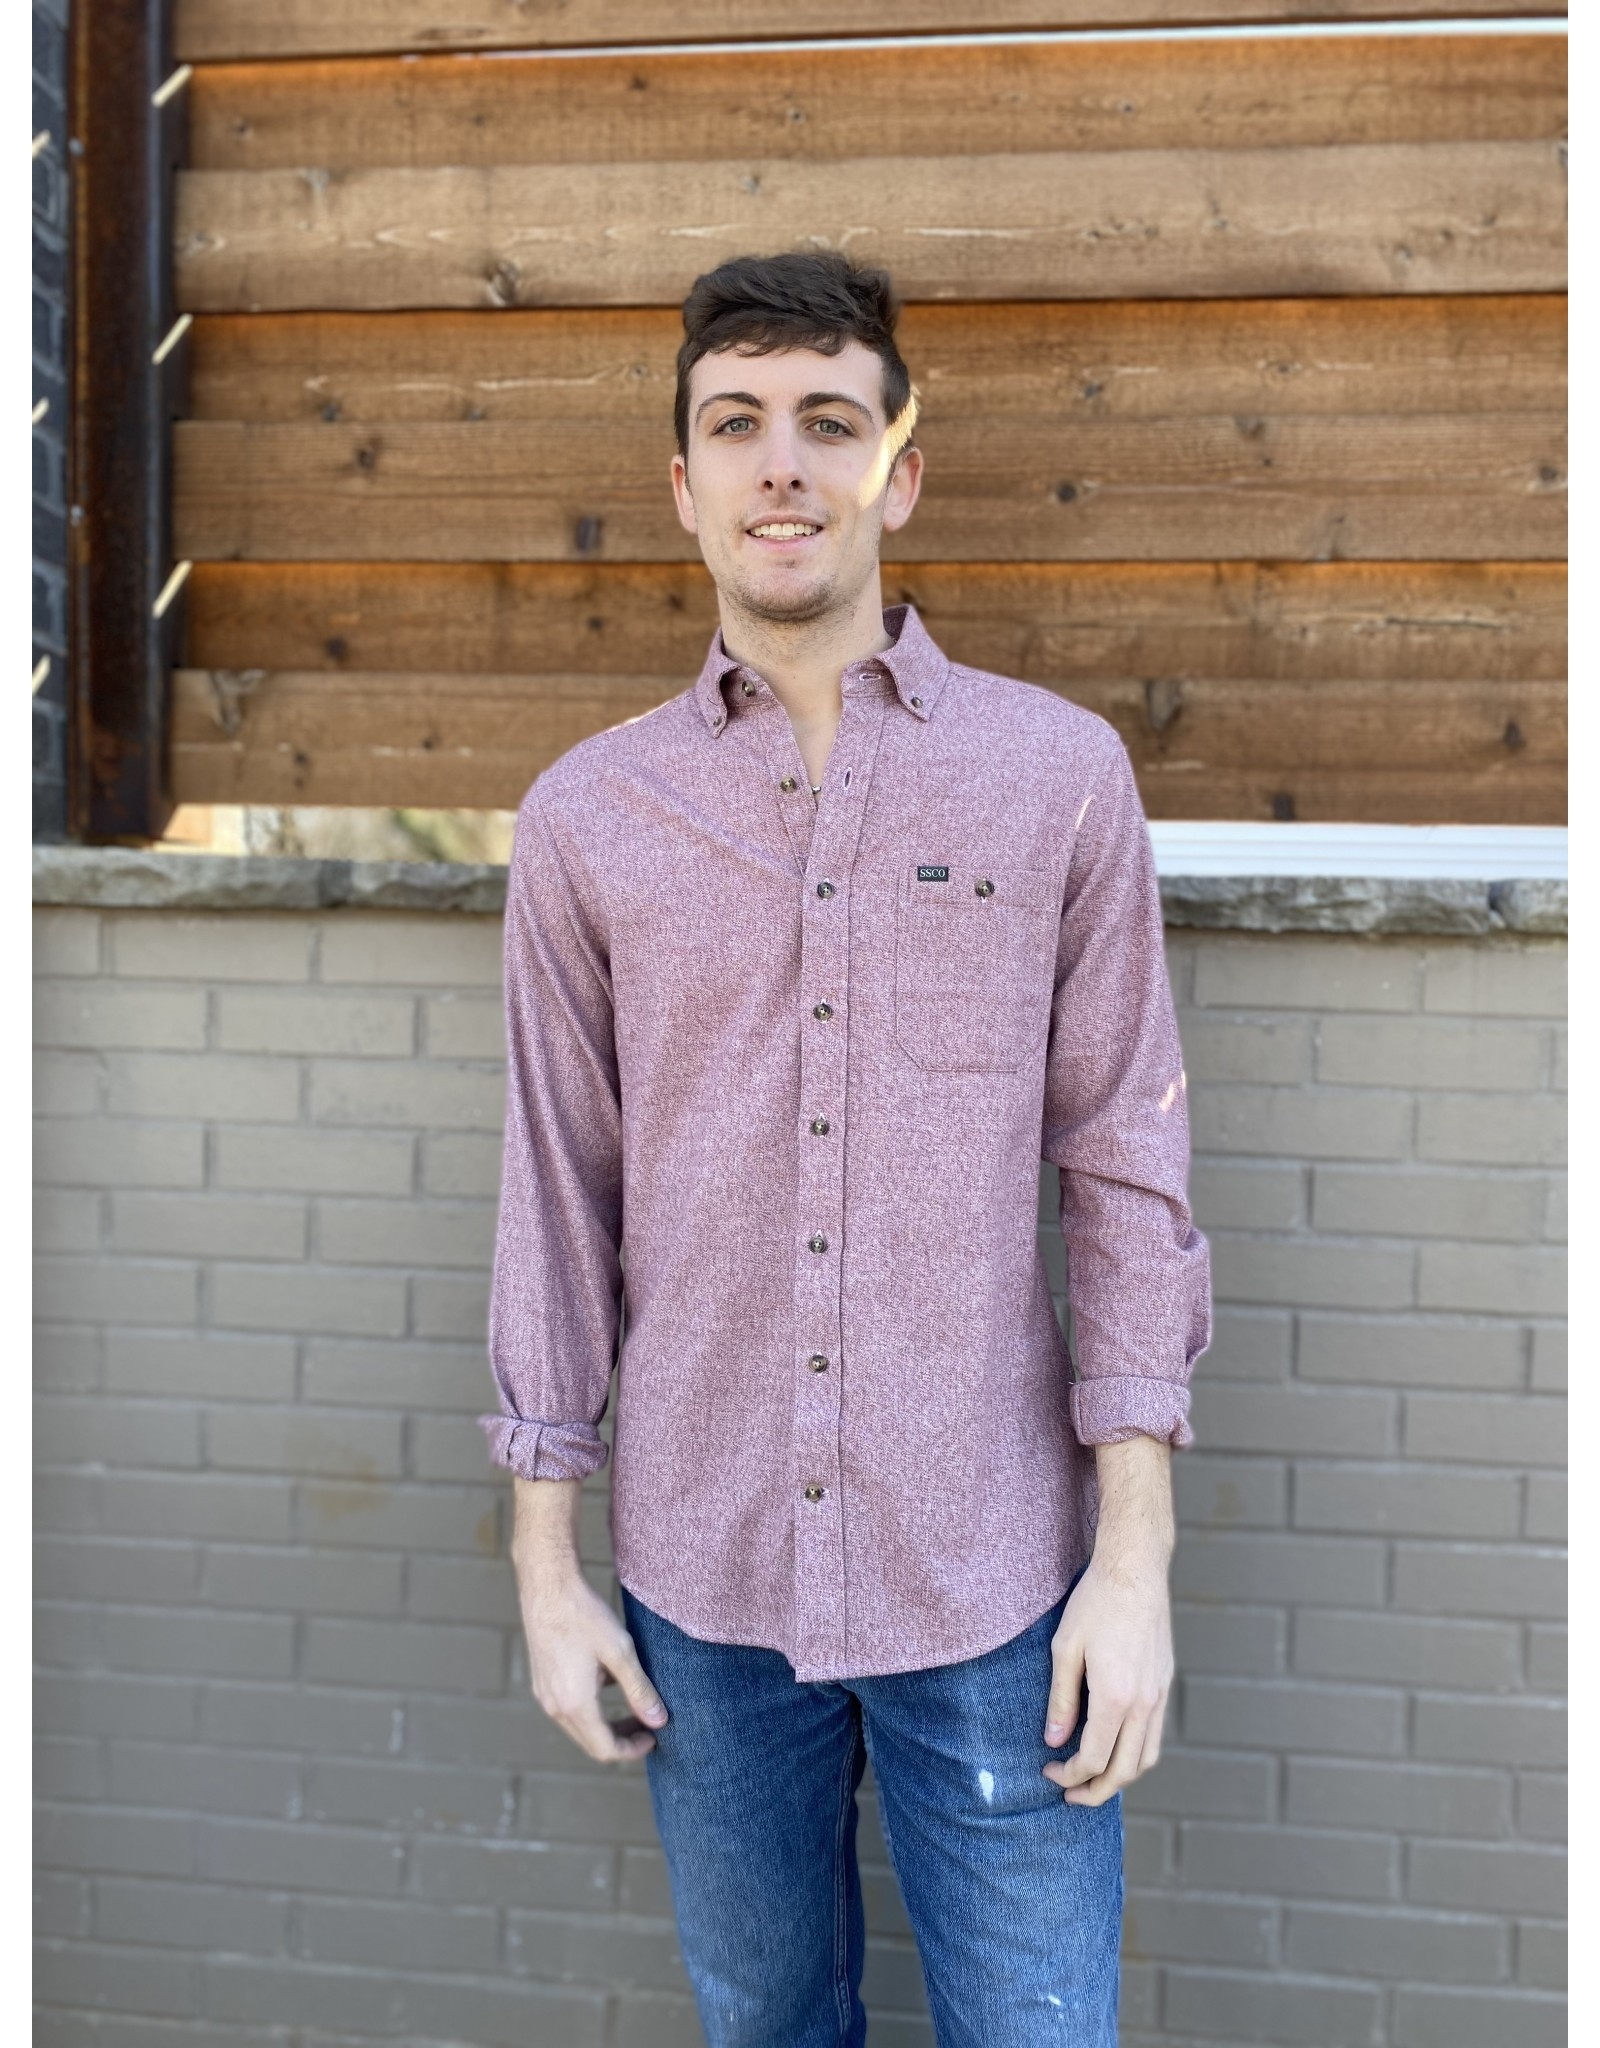 Southern Shirt Co. Southern Shirt Co. Oakhill Melange Flannel